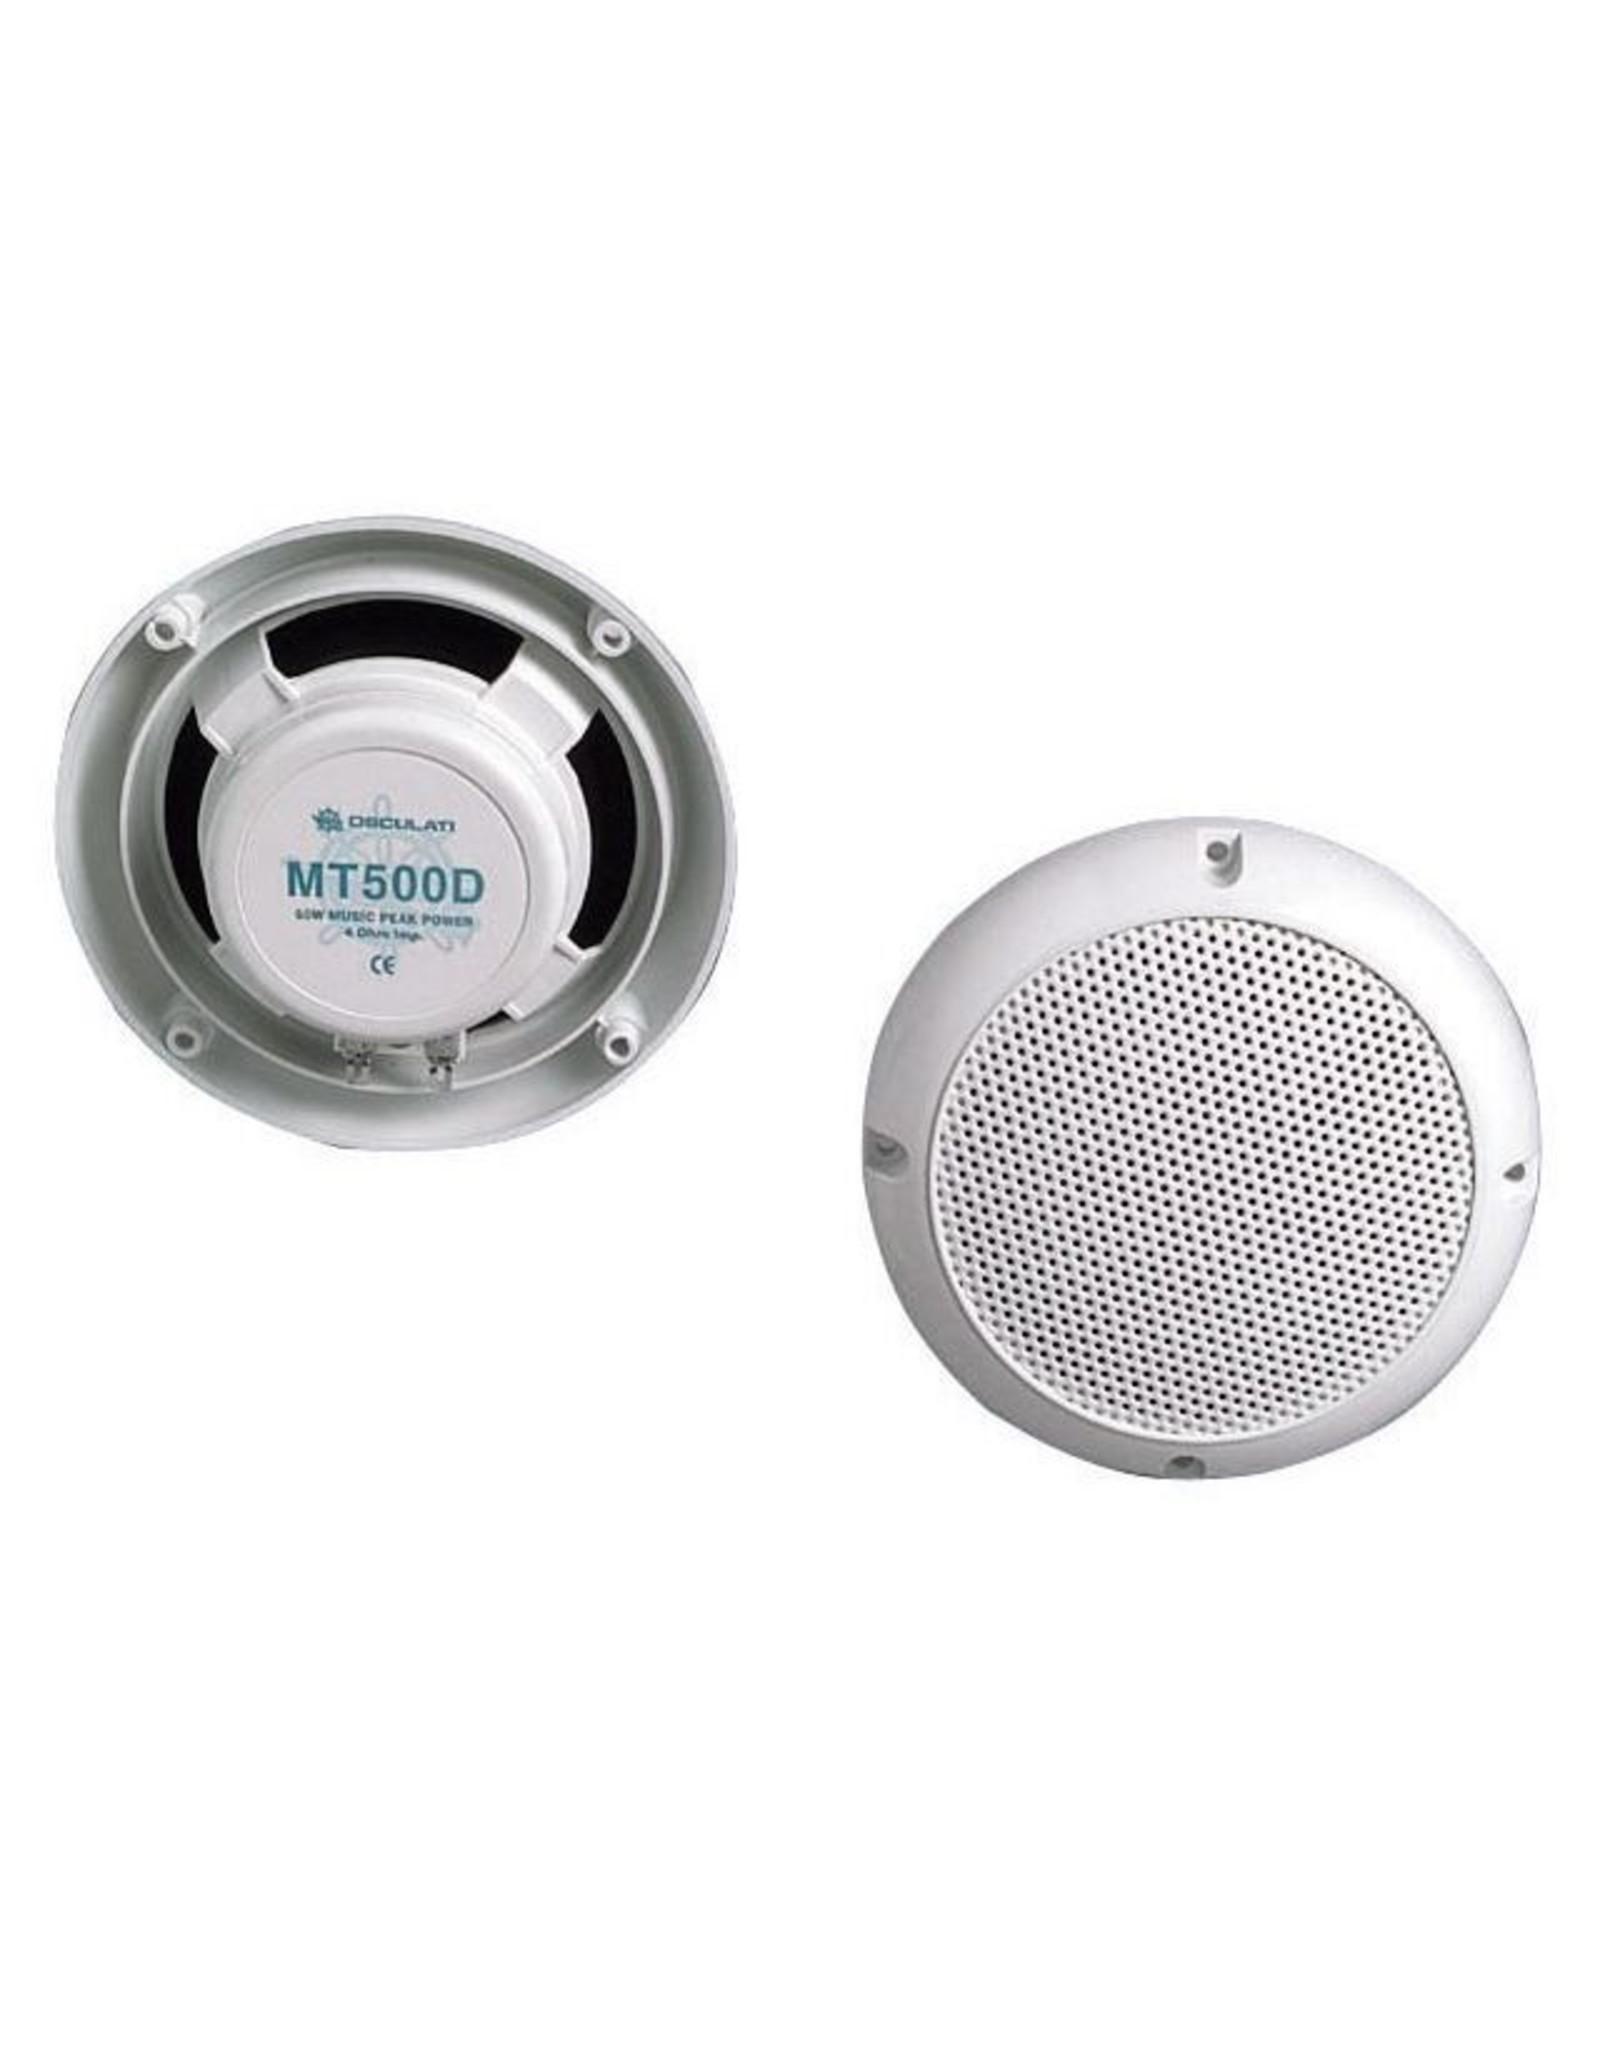 Hebor Watersport Osculati 60 Watts marine speakers